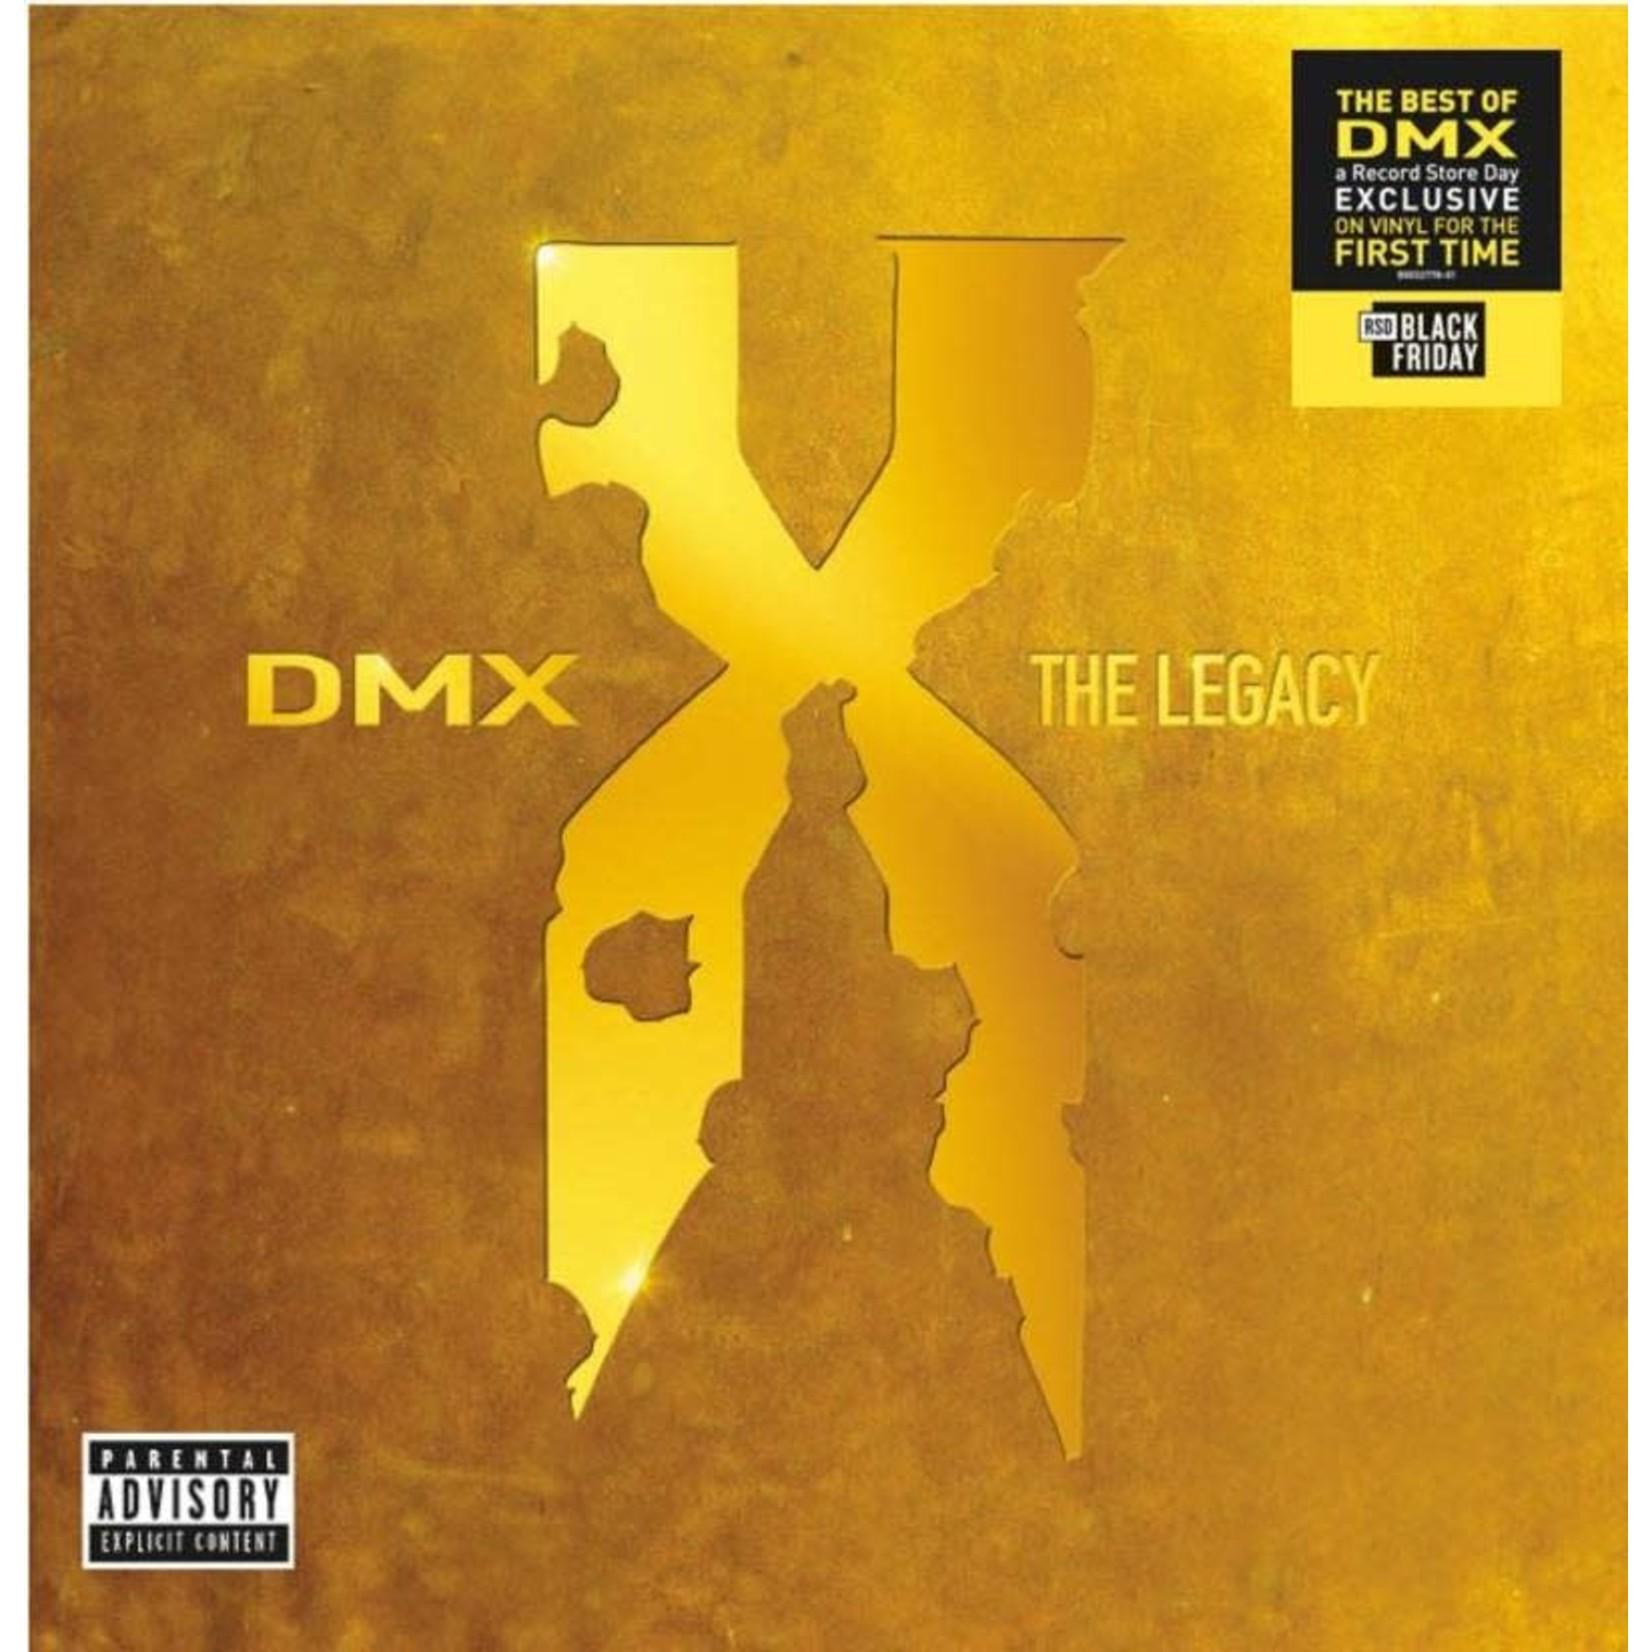 DMX BF 2020 - THE LEGACY (2LP)